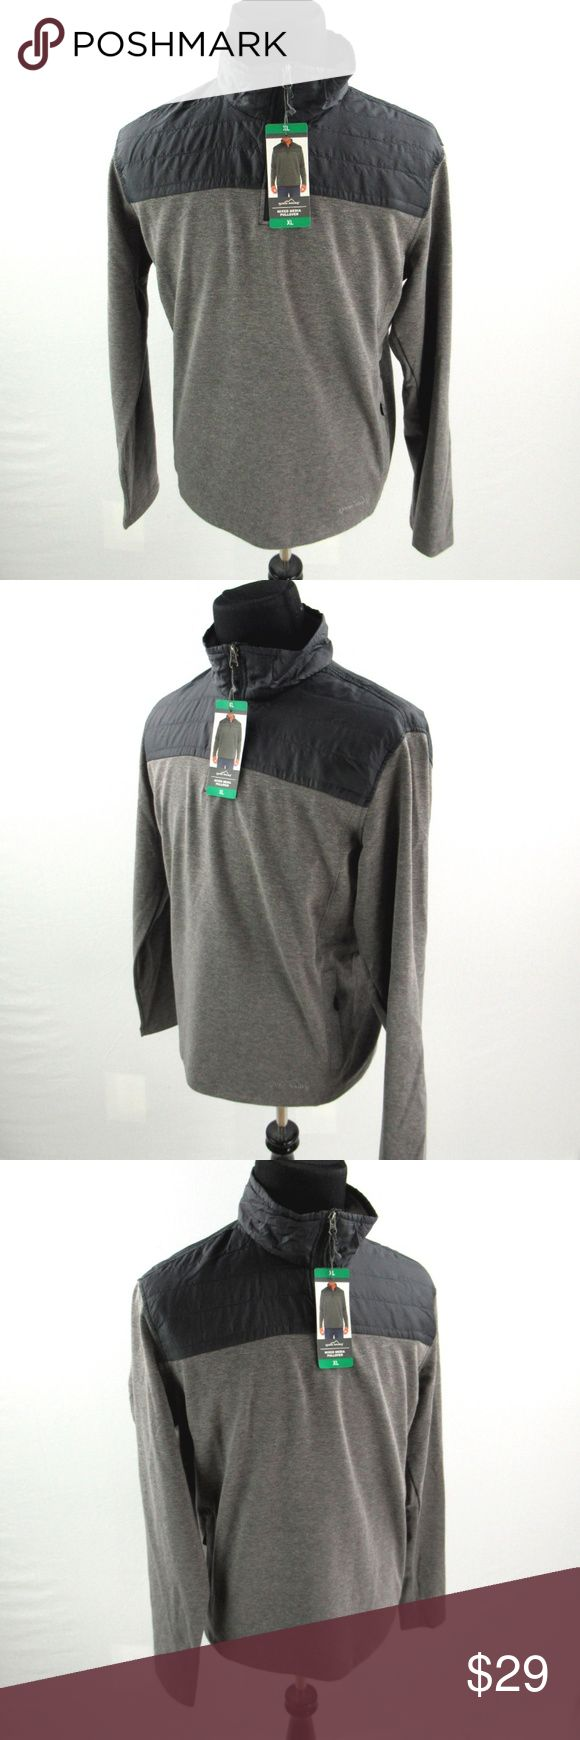 NEW Eddie Bauer Mixed Media Pullover Mens XL Shirt Gray 1//4 Zip Layer NWT